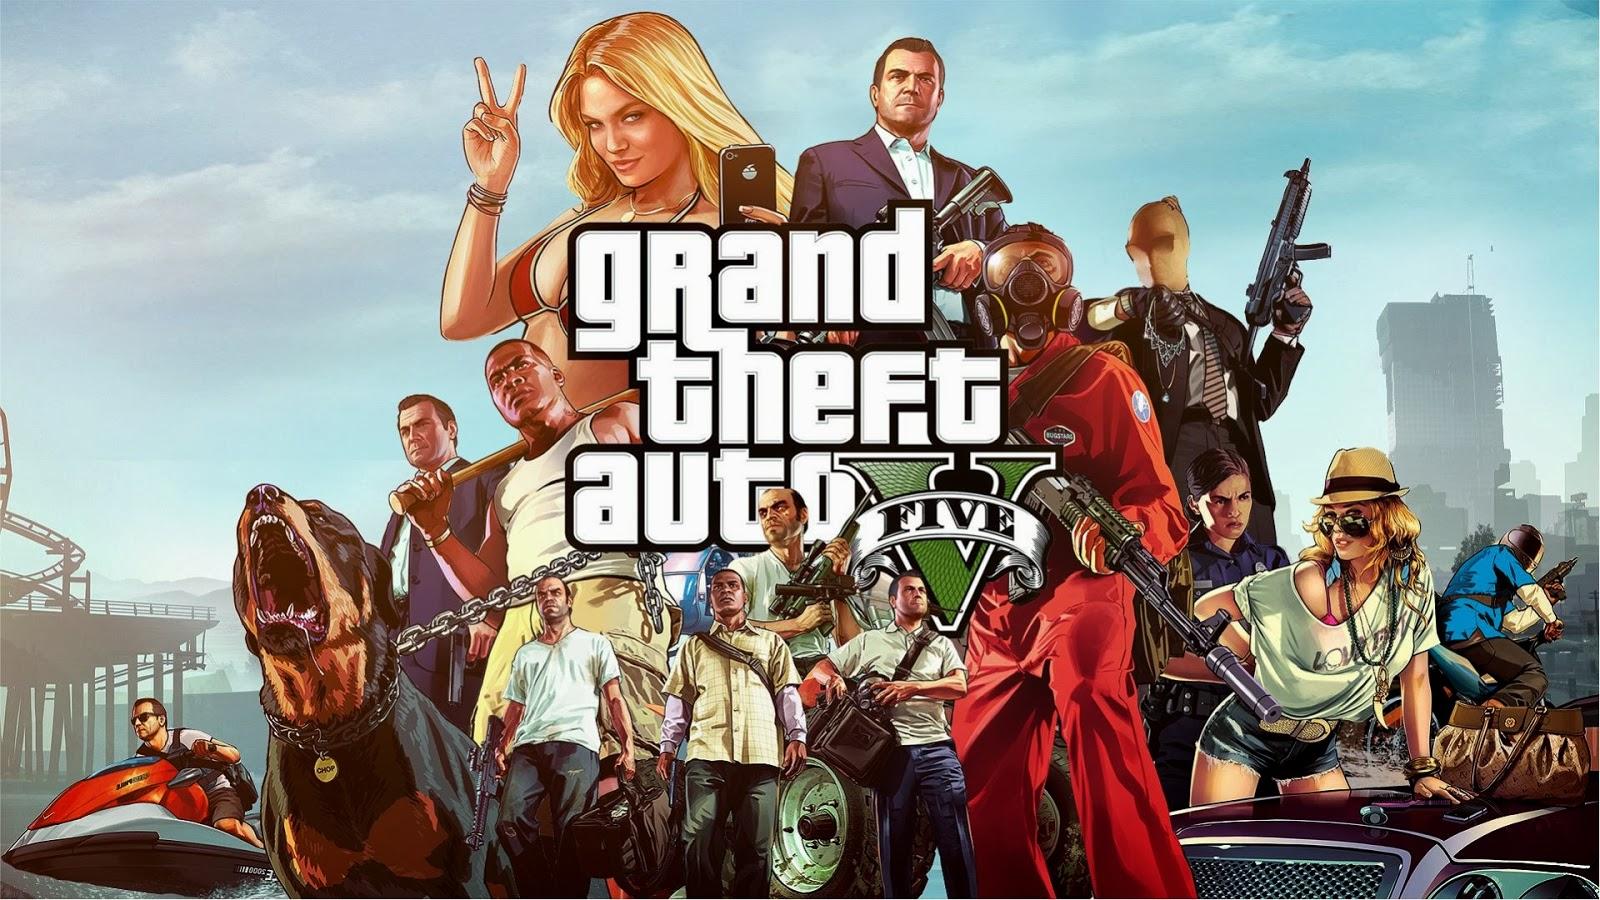 Free Download Wallpaper Gta Grand Theft Auto 5 Hd Gratis